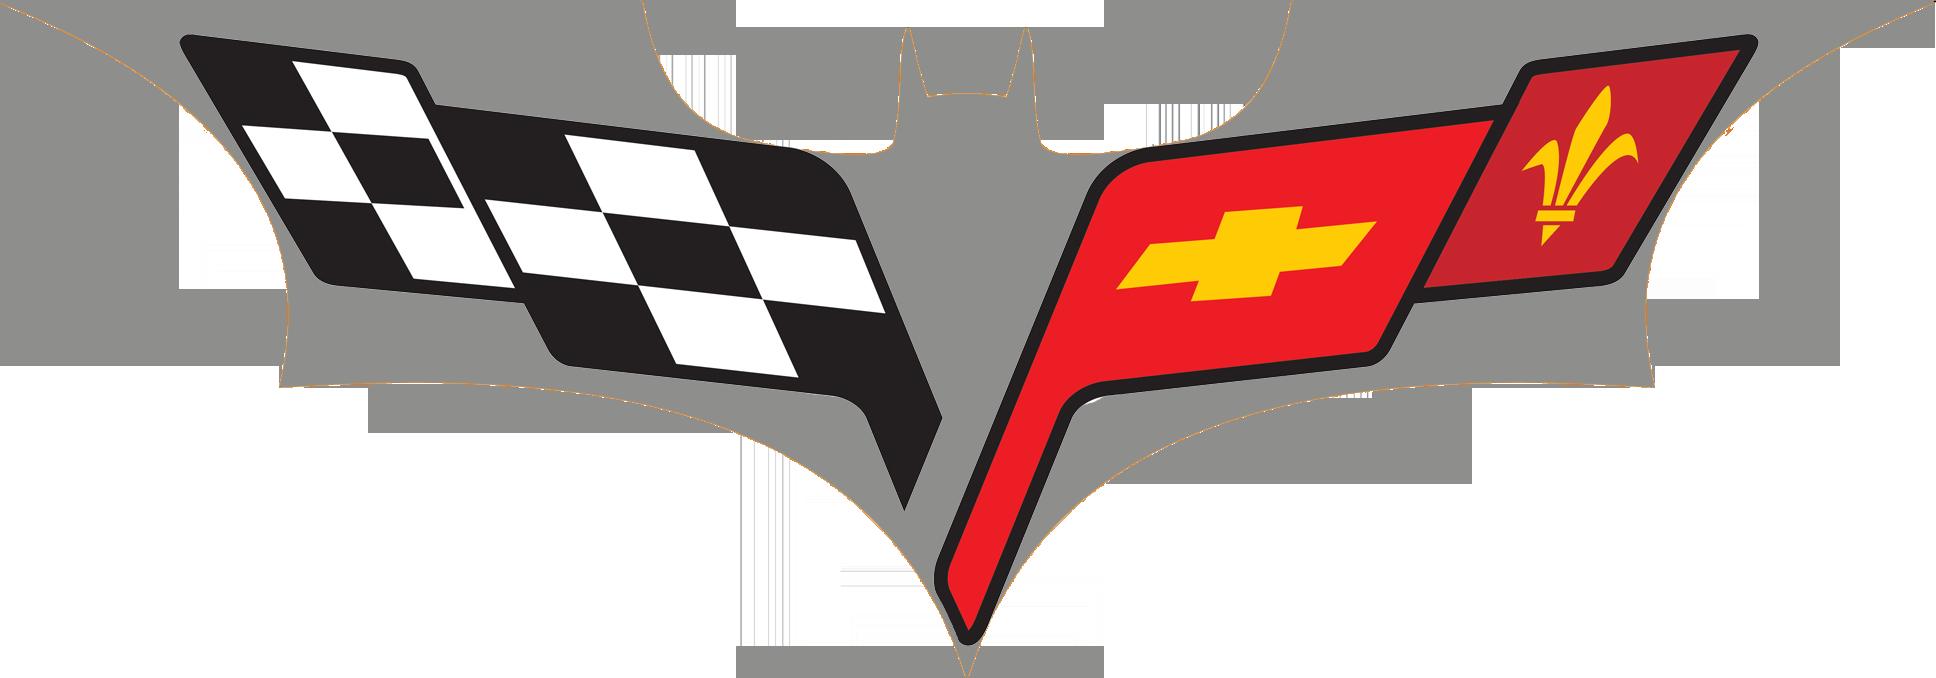 Summary Corvette Logo Wallpaper Generator For Mobile Devices